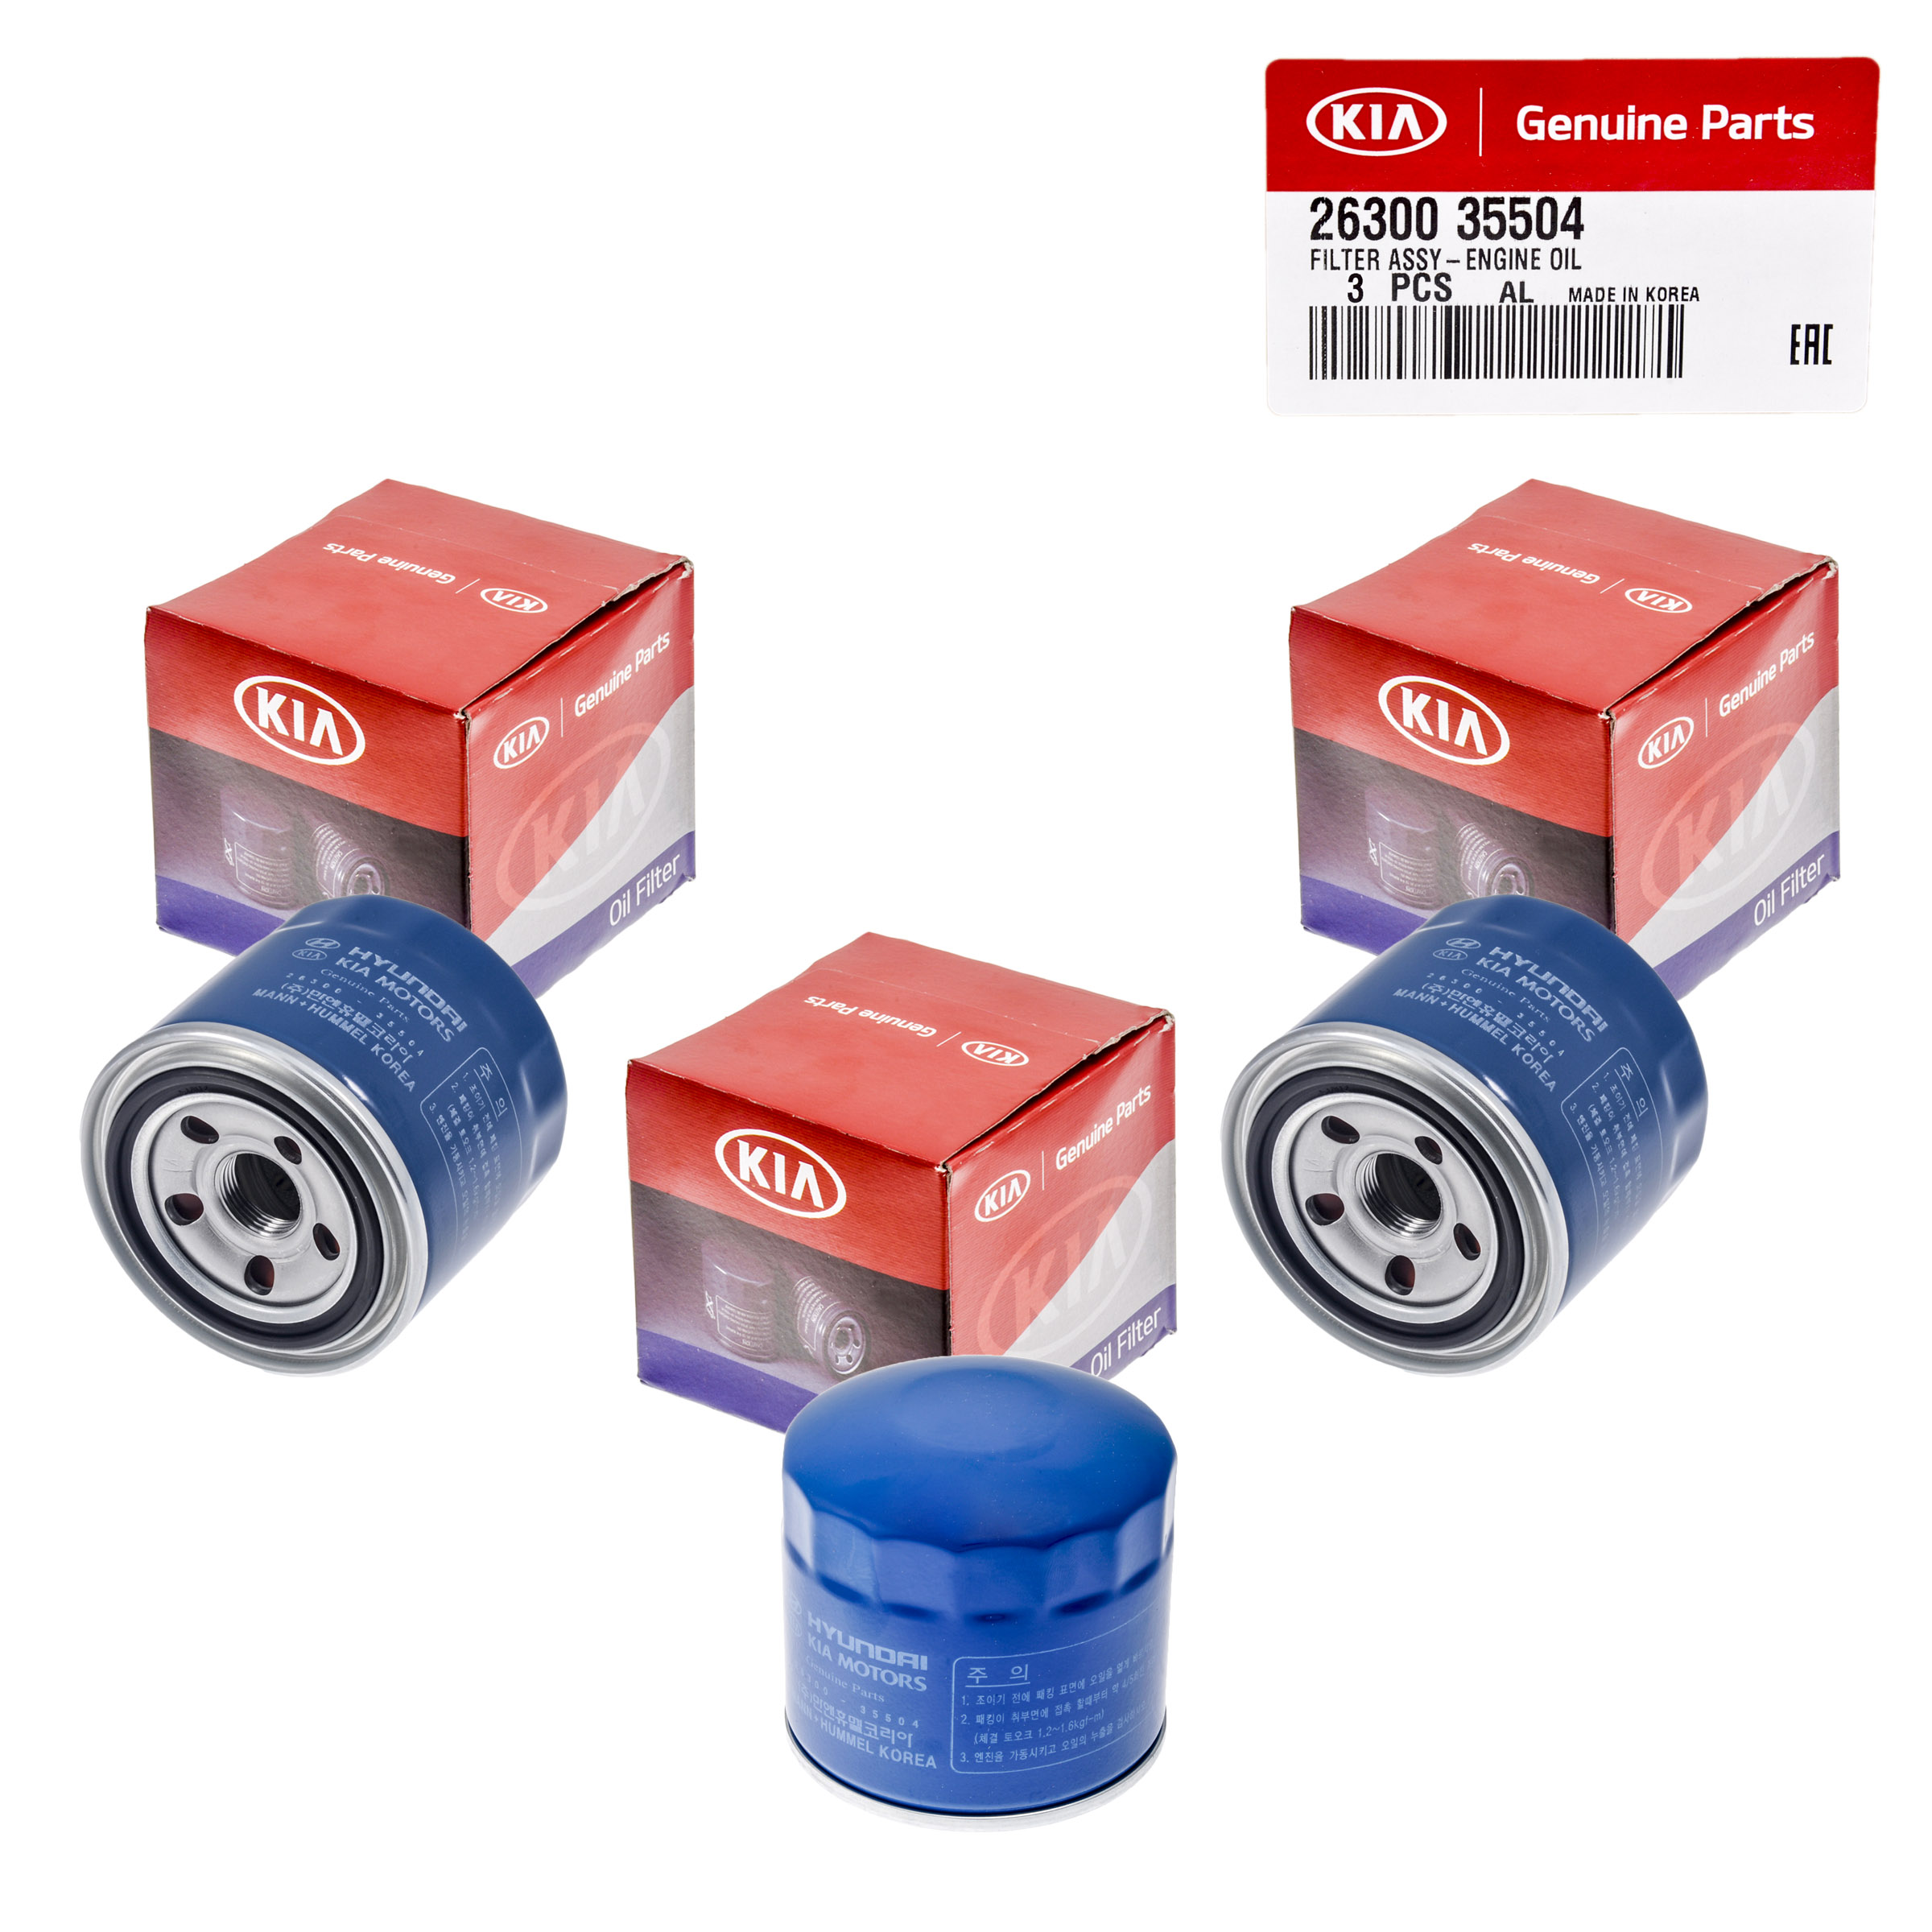 Set Of 3 Genuine OEM Oil Filter 26300-35504 For Kia Soul Optima Sportage 72-16